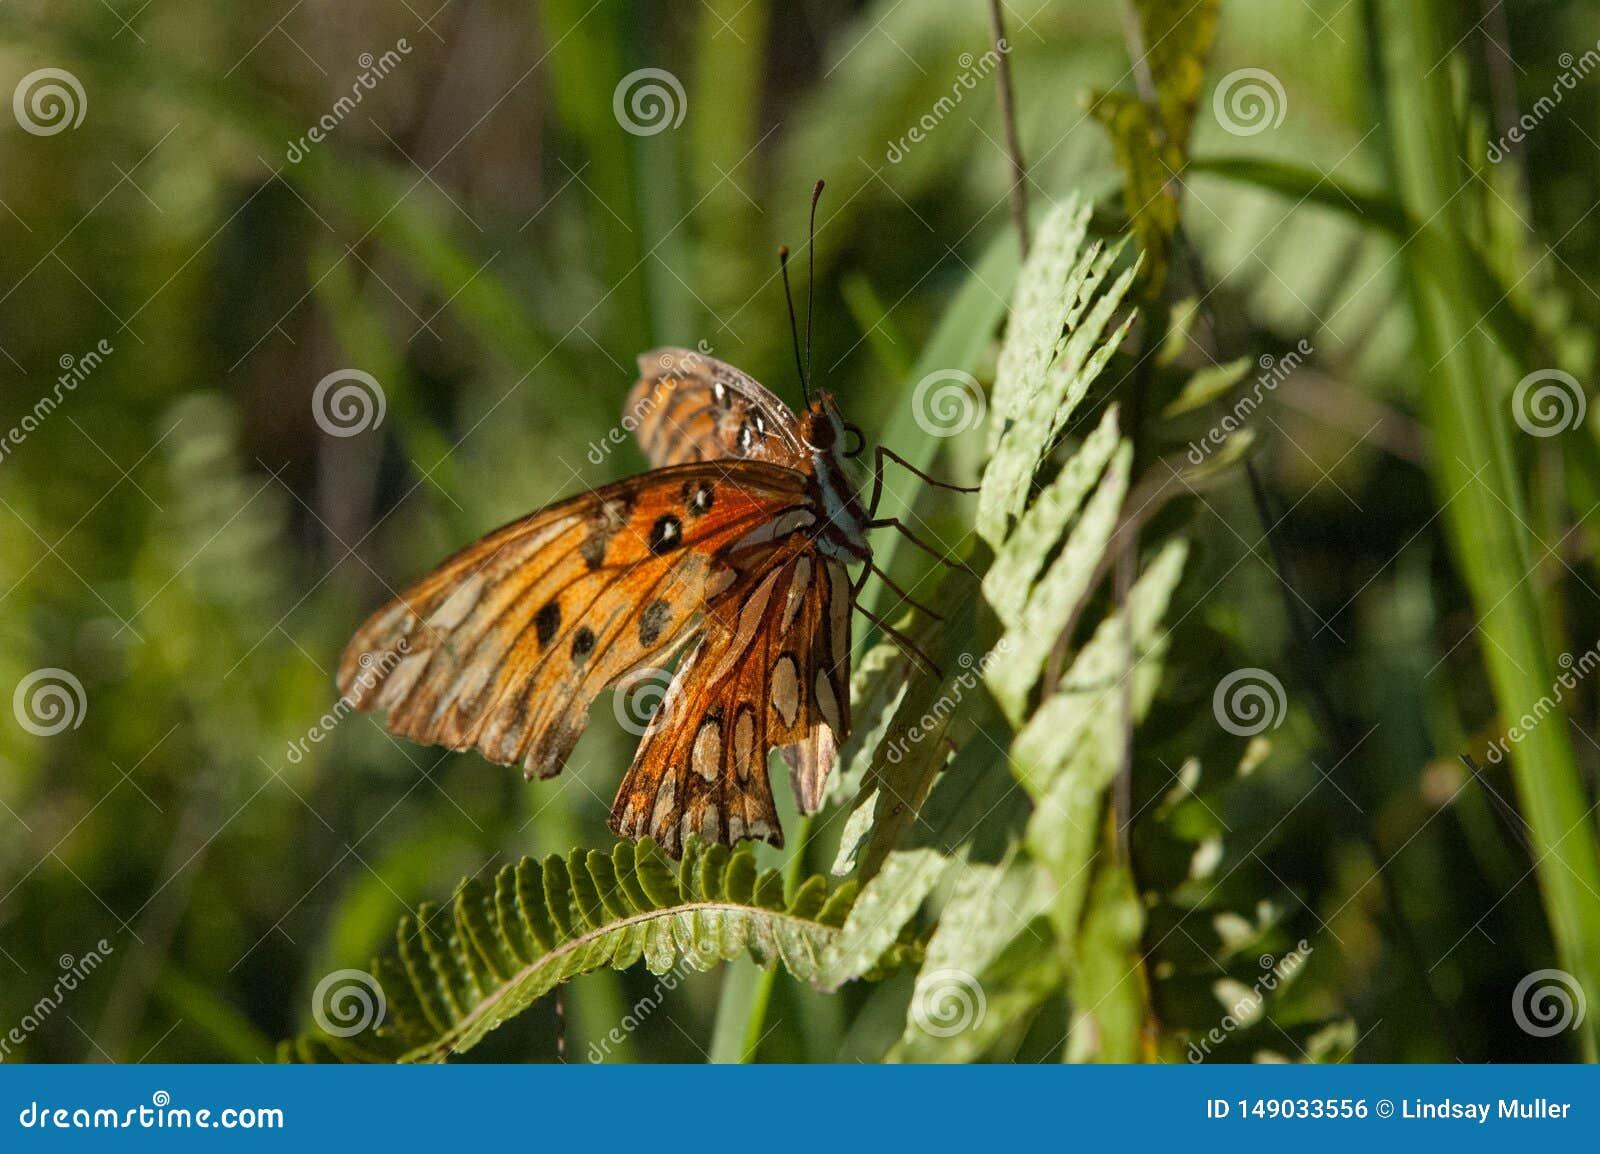 Mariposa anaranjada con el ala quebrada